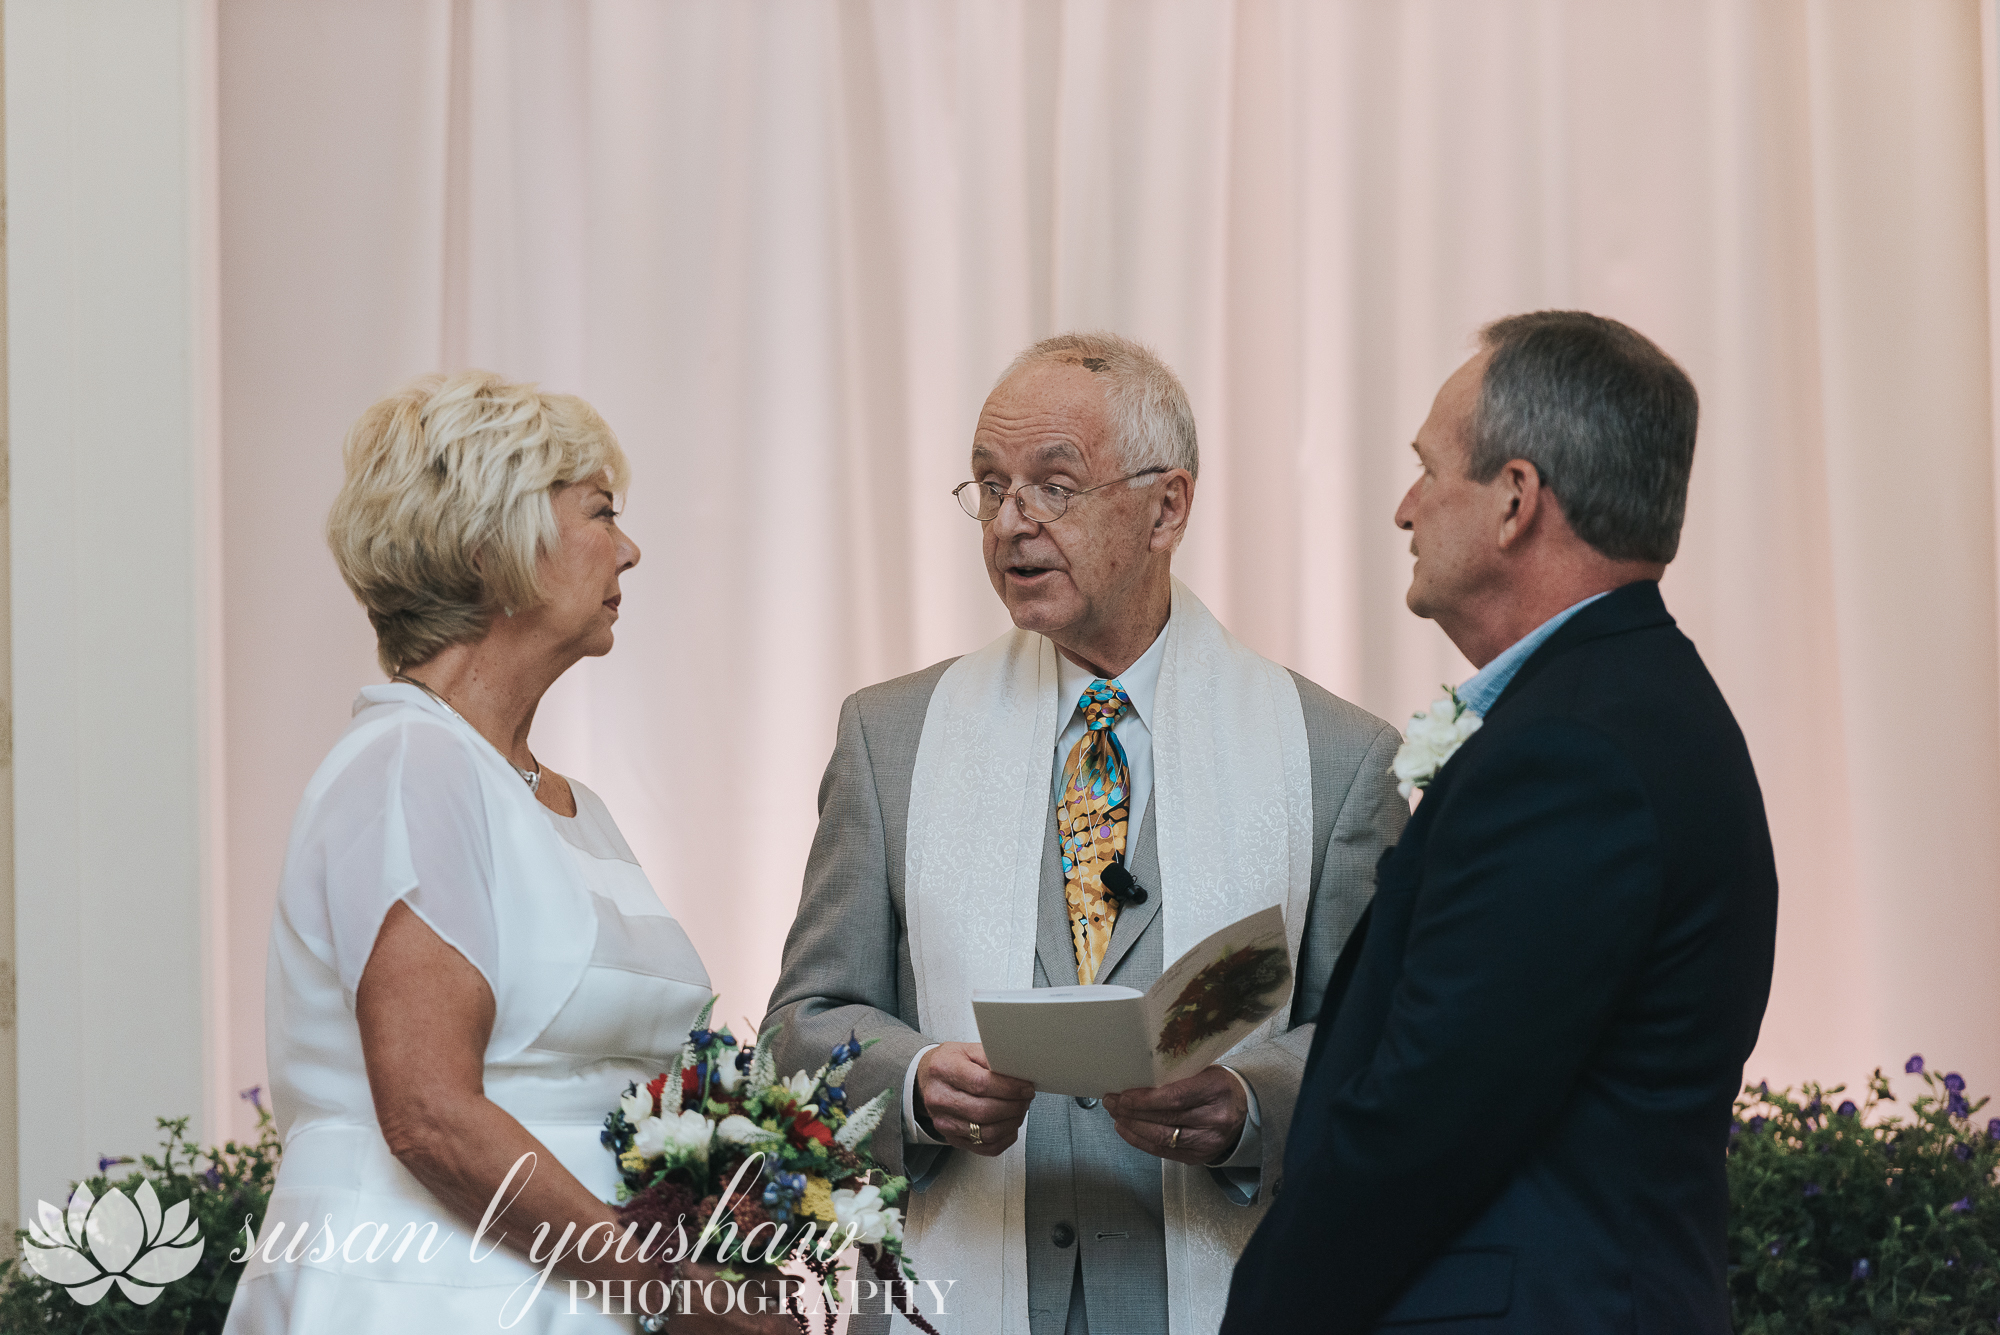 BLOG Carolyn Adams and Jim McCune 07-04-2018 SLY Photography-66.jpg